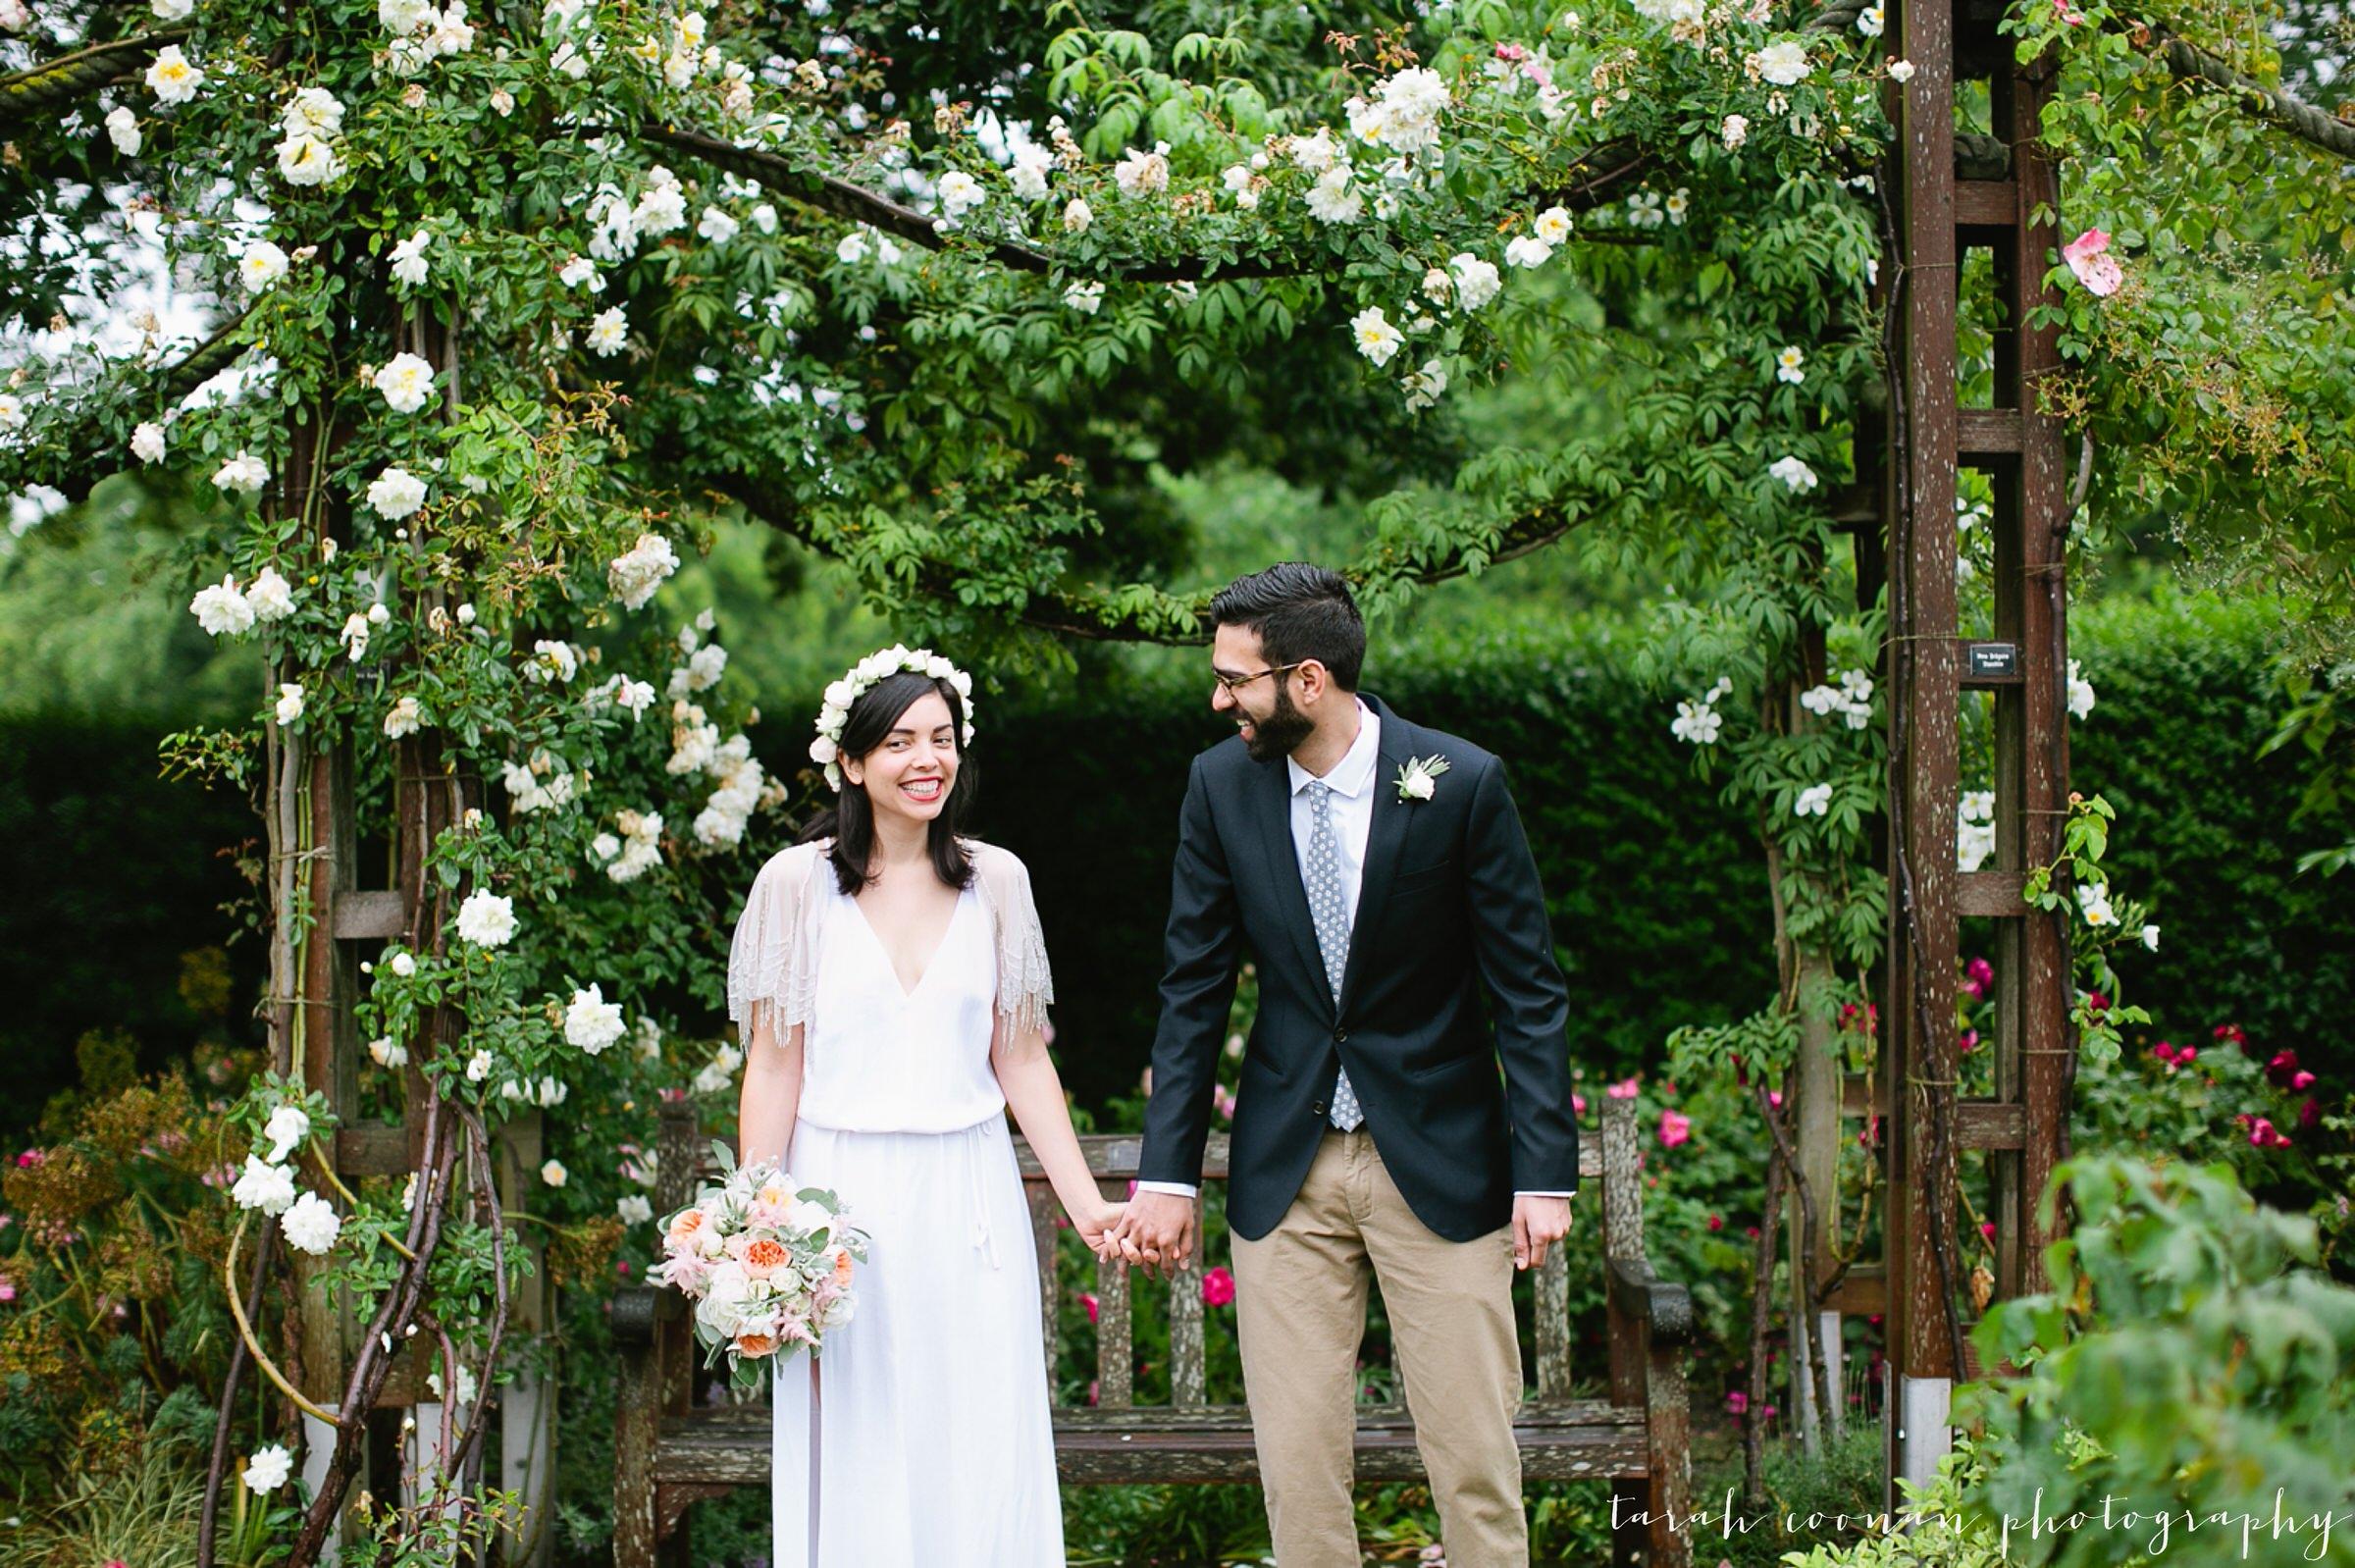 brighton-wedding-photographer64